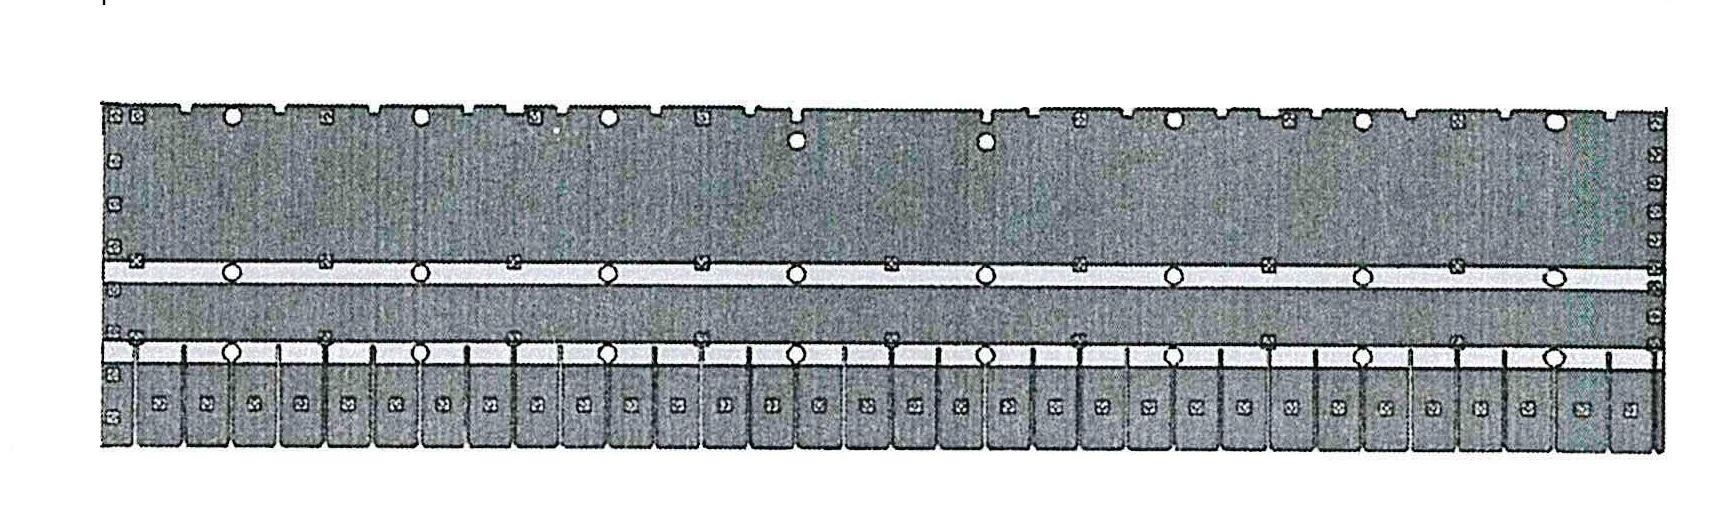 GaN Plank Controller2.jpg